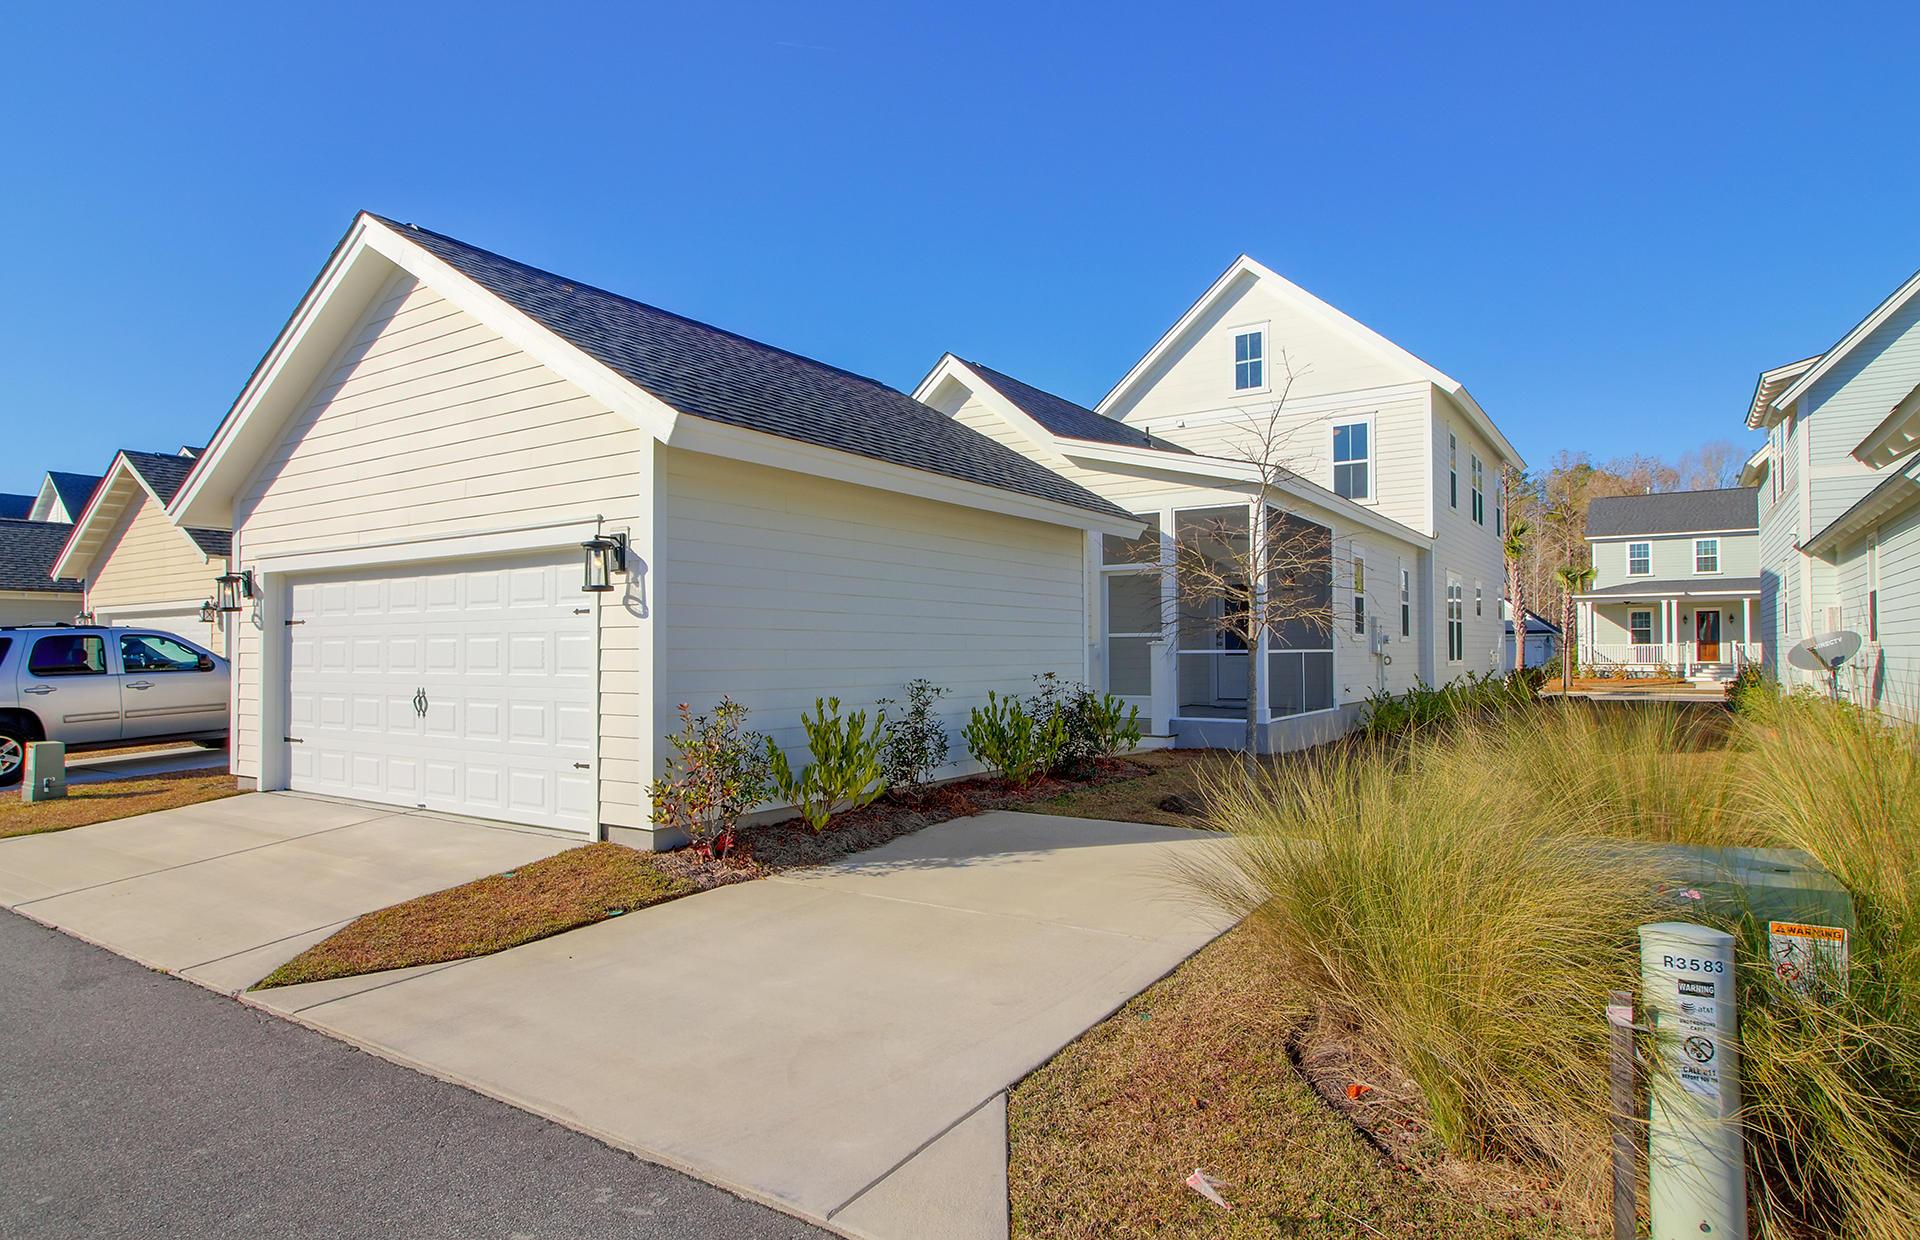 Carolina Park Homes For Sale - 3583 Backshore, Mount Pleasant, SC - 6